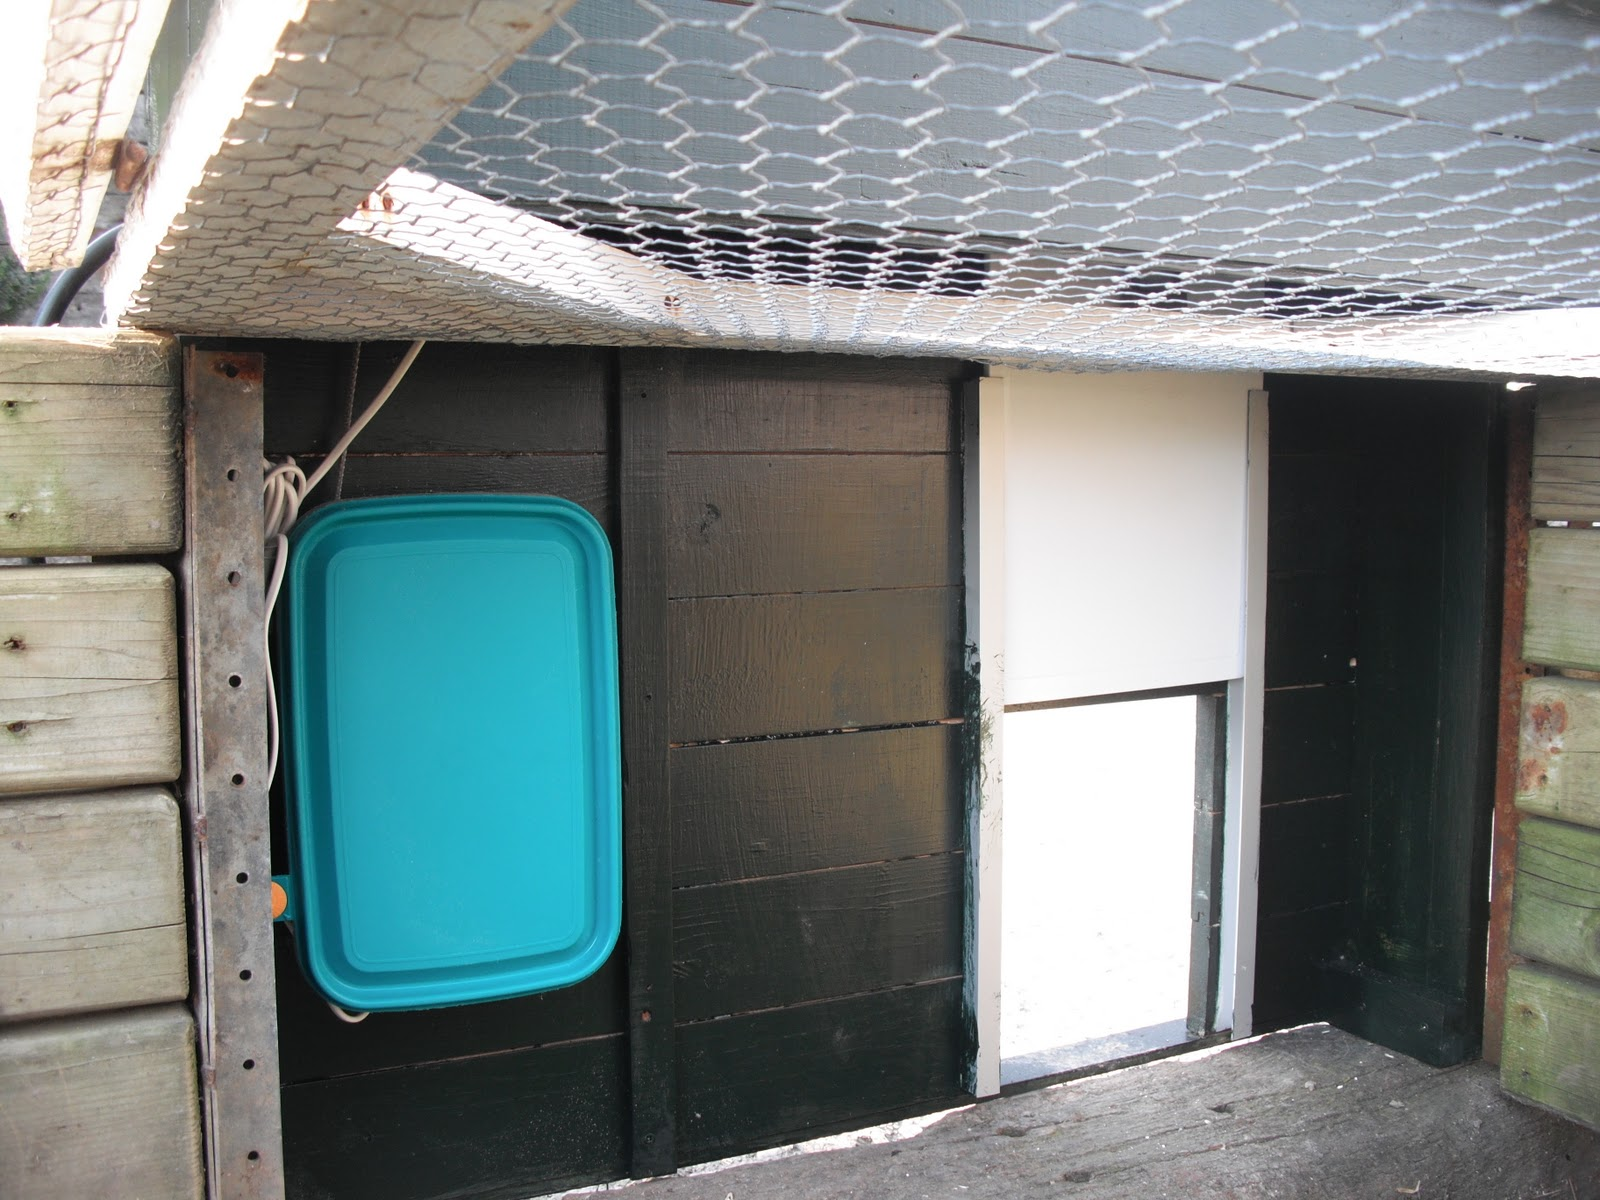 motor puerta automatica leroy merlin